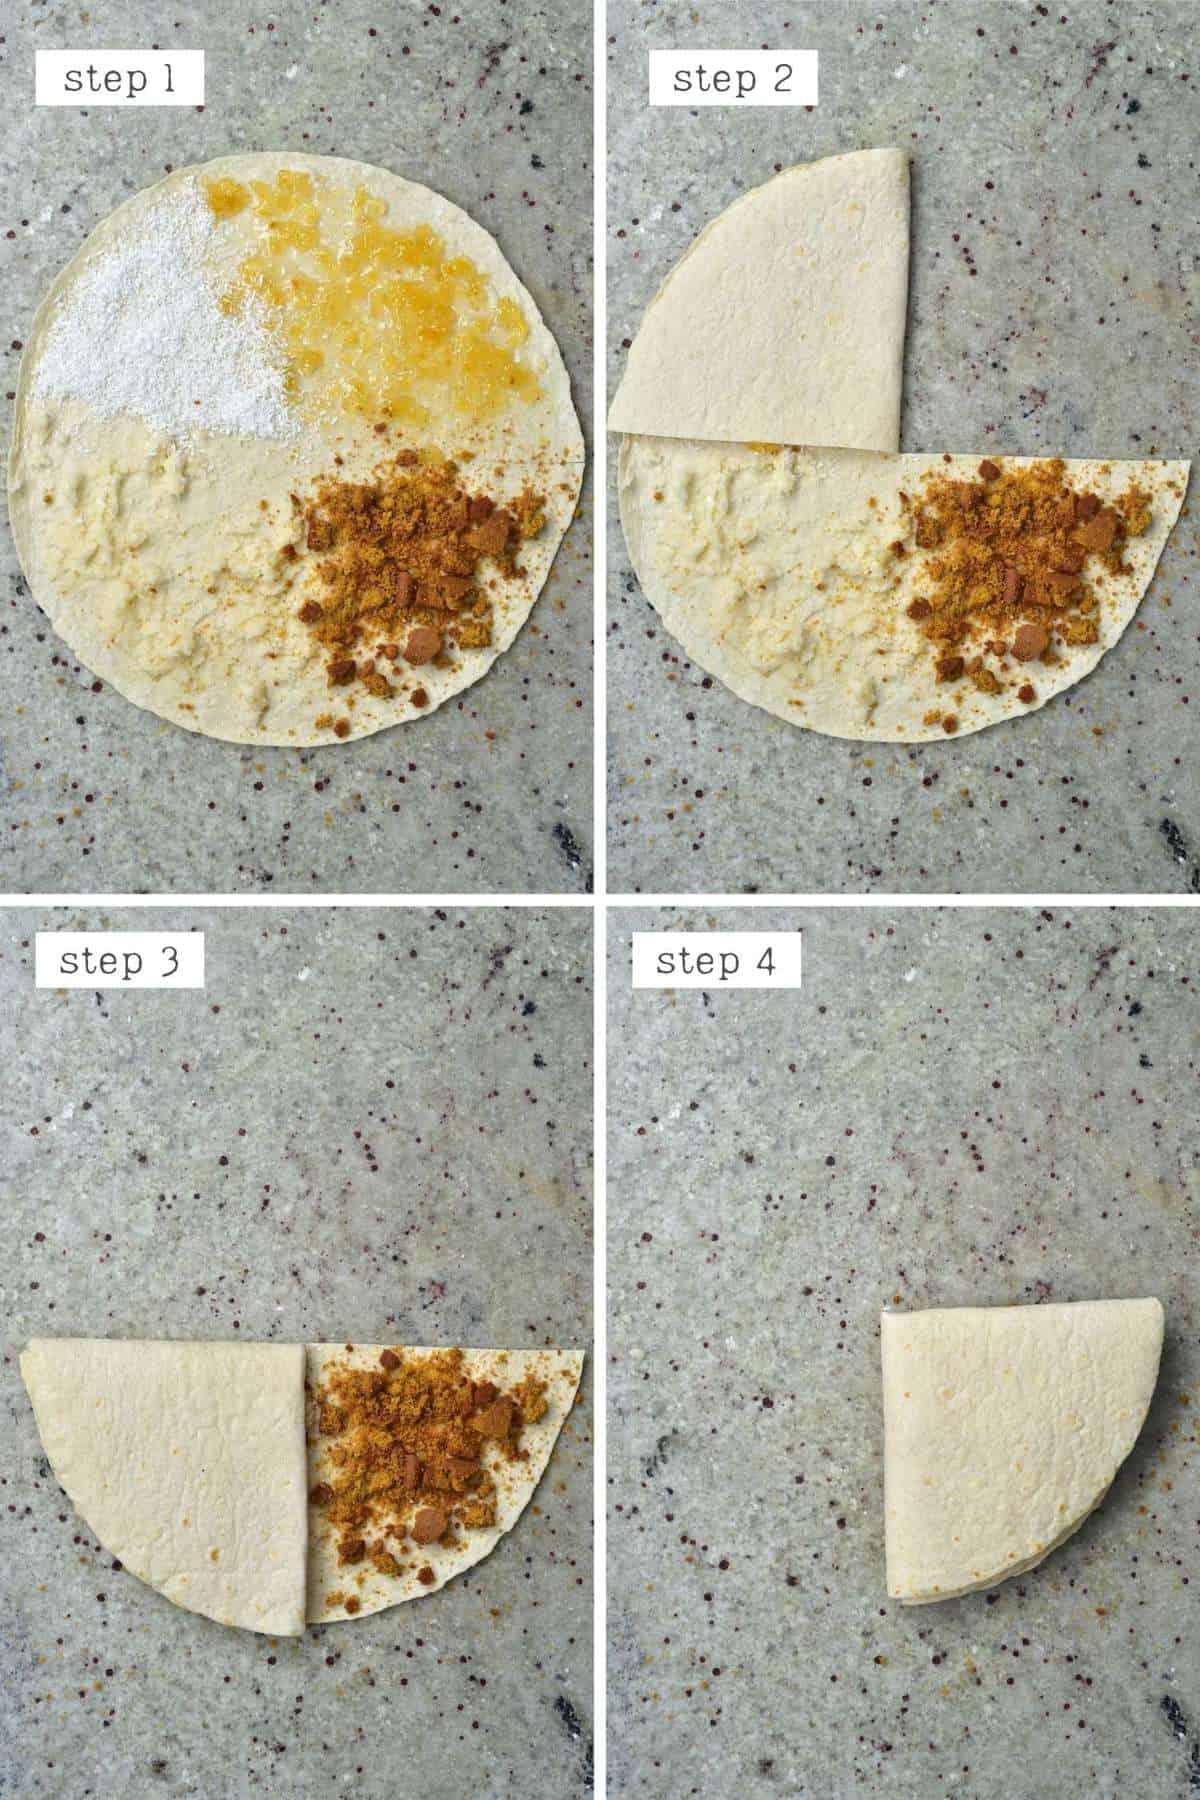 Steps for folding a tortilla